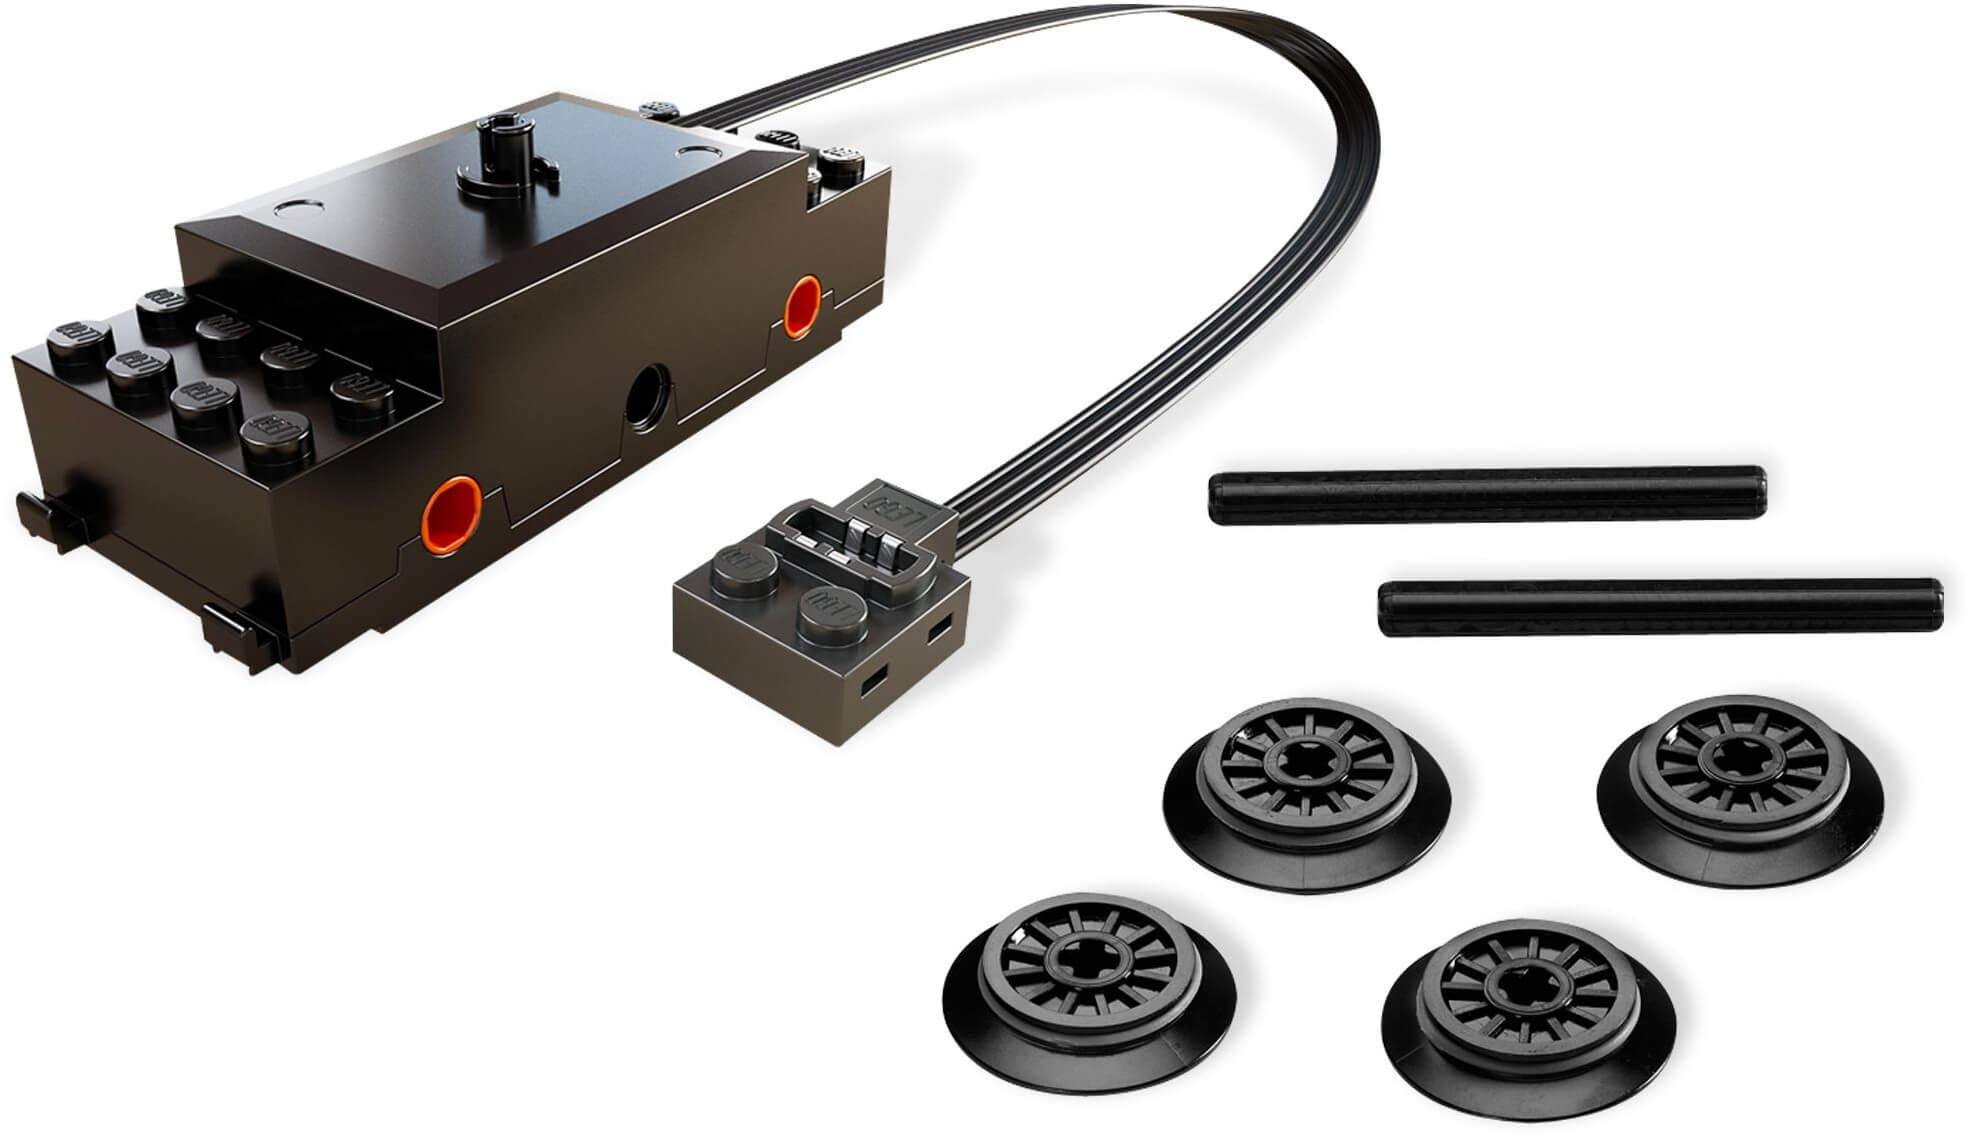 Mua đồ chơi LEGO 88002 - LEGO Power Functions 88002 - Bộ động cơ Xe lửa (LEGO Power Functions Train Motor 88002)